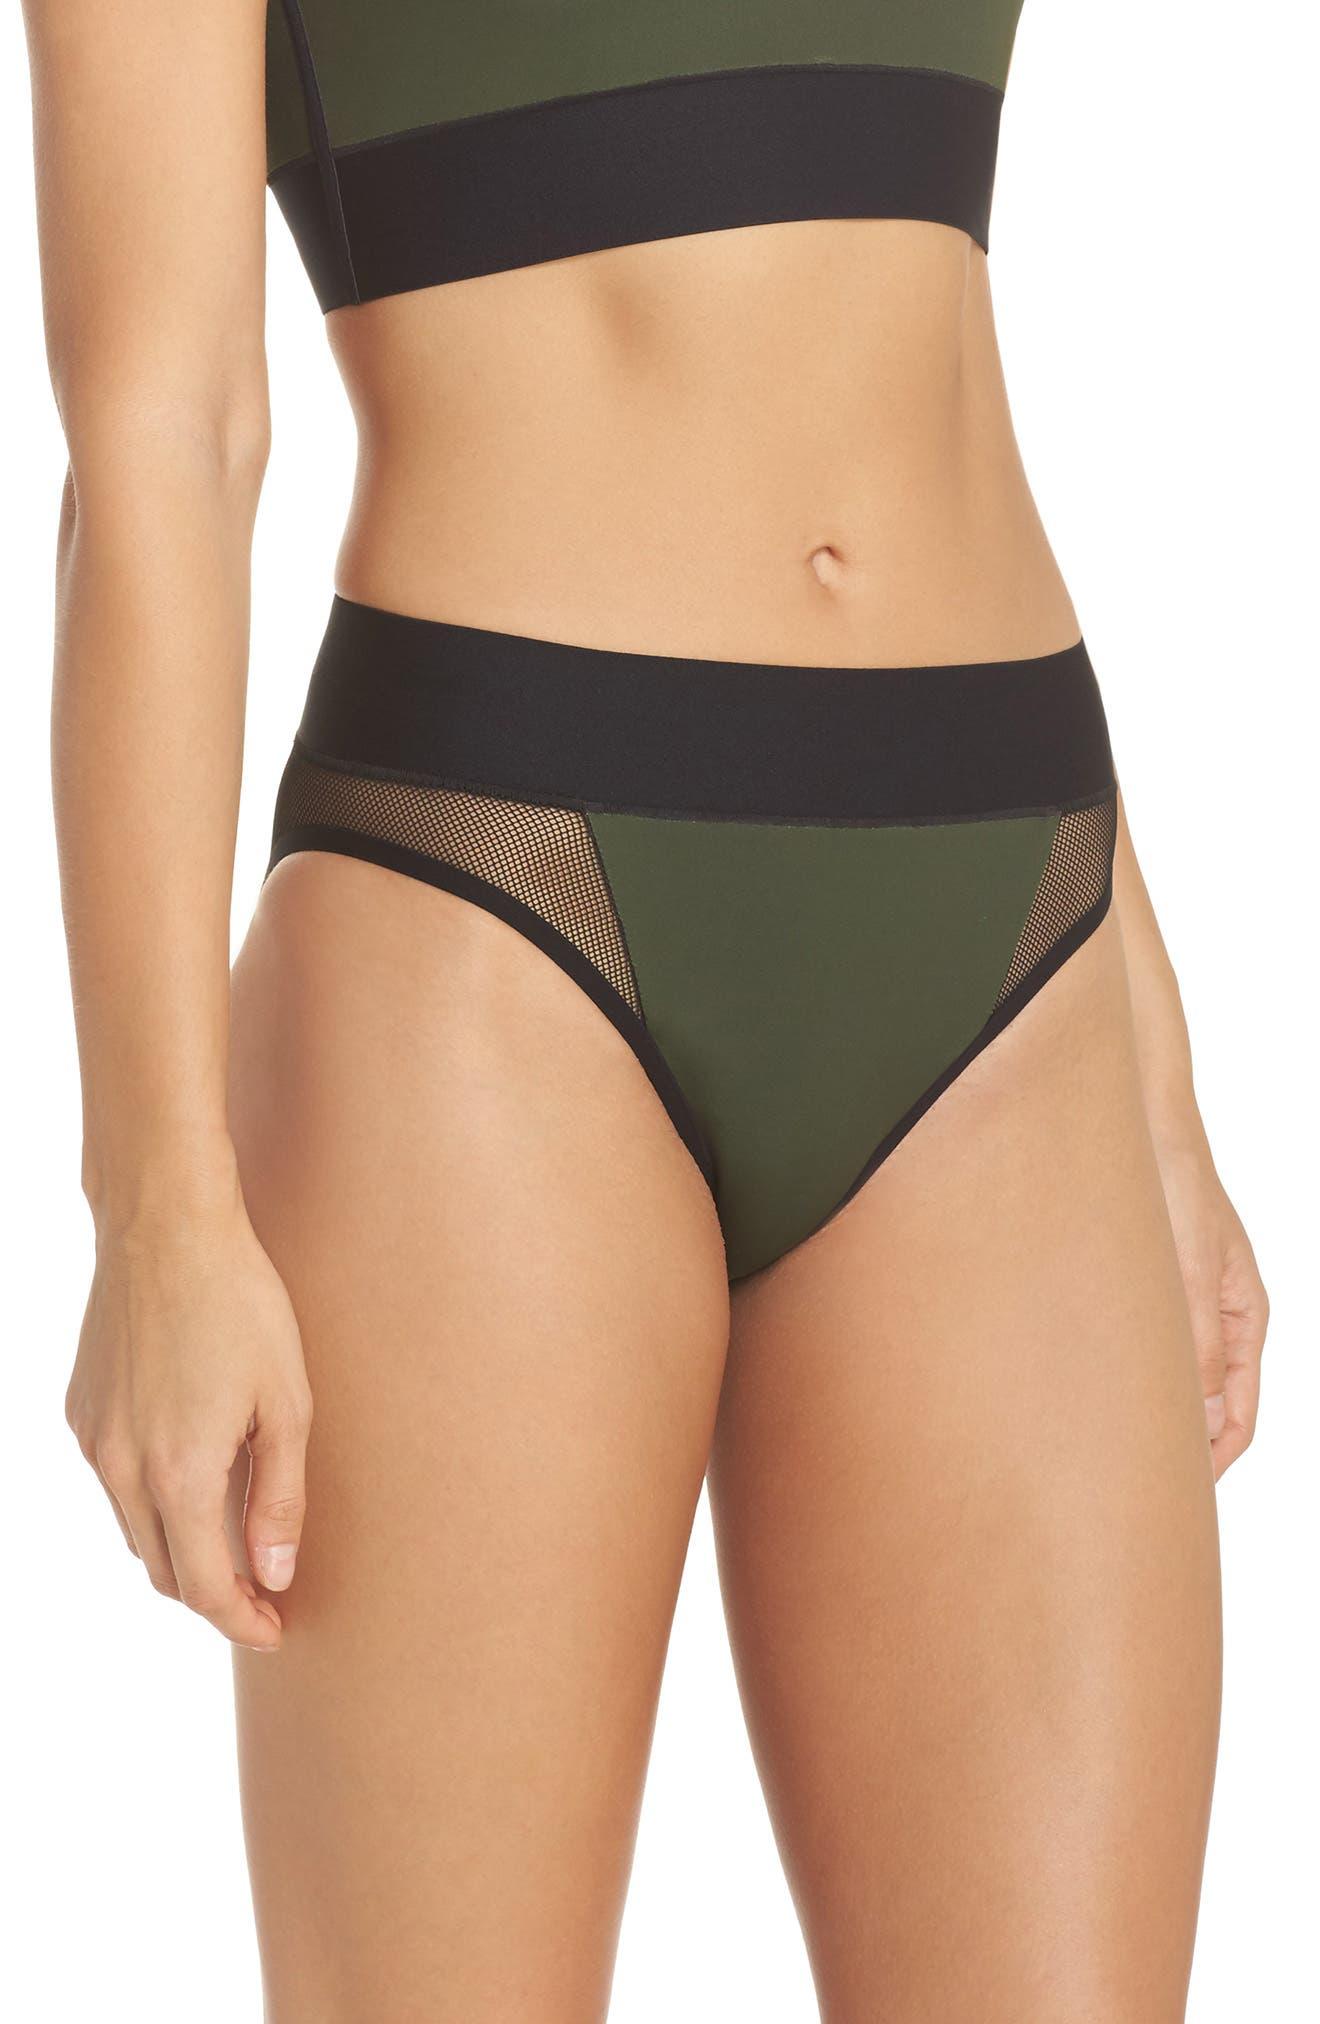 Reef Sport Mesh High-Waist Bikini Bottoms,                             Alternate thumbnail 3, color,                             302